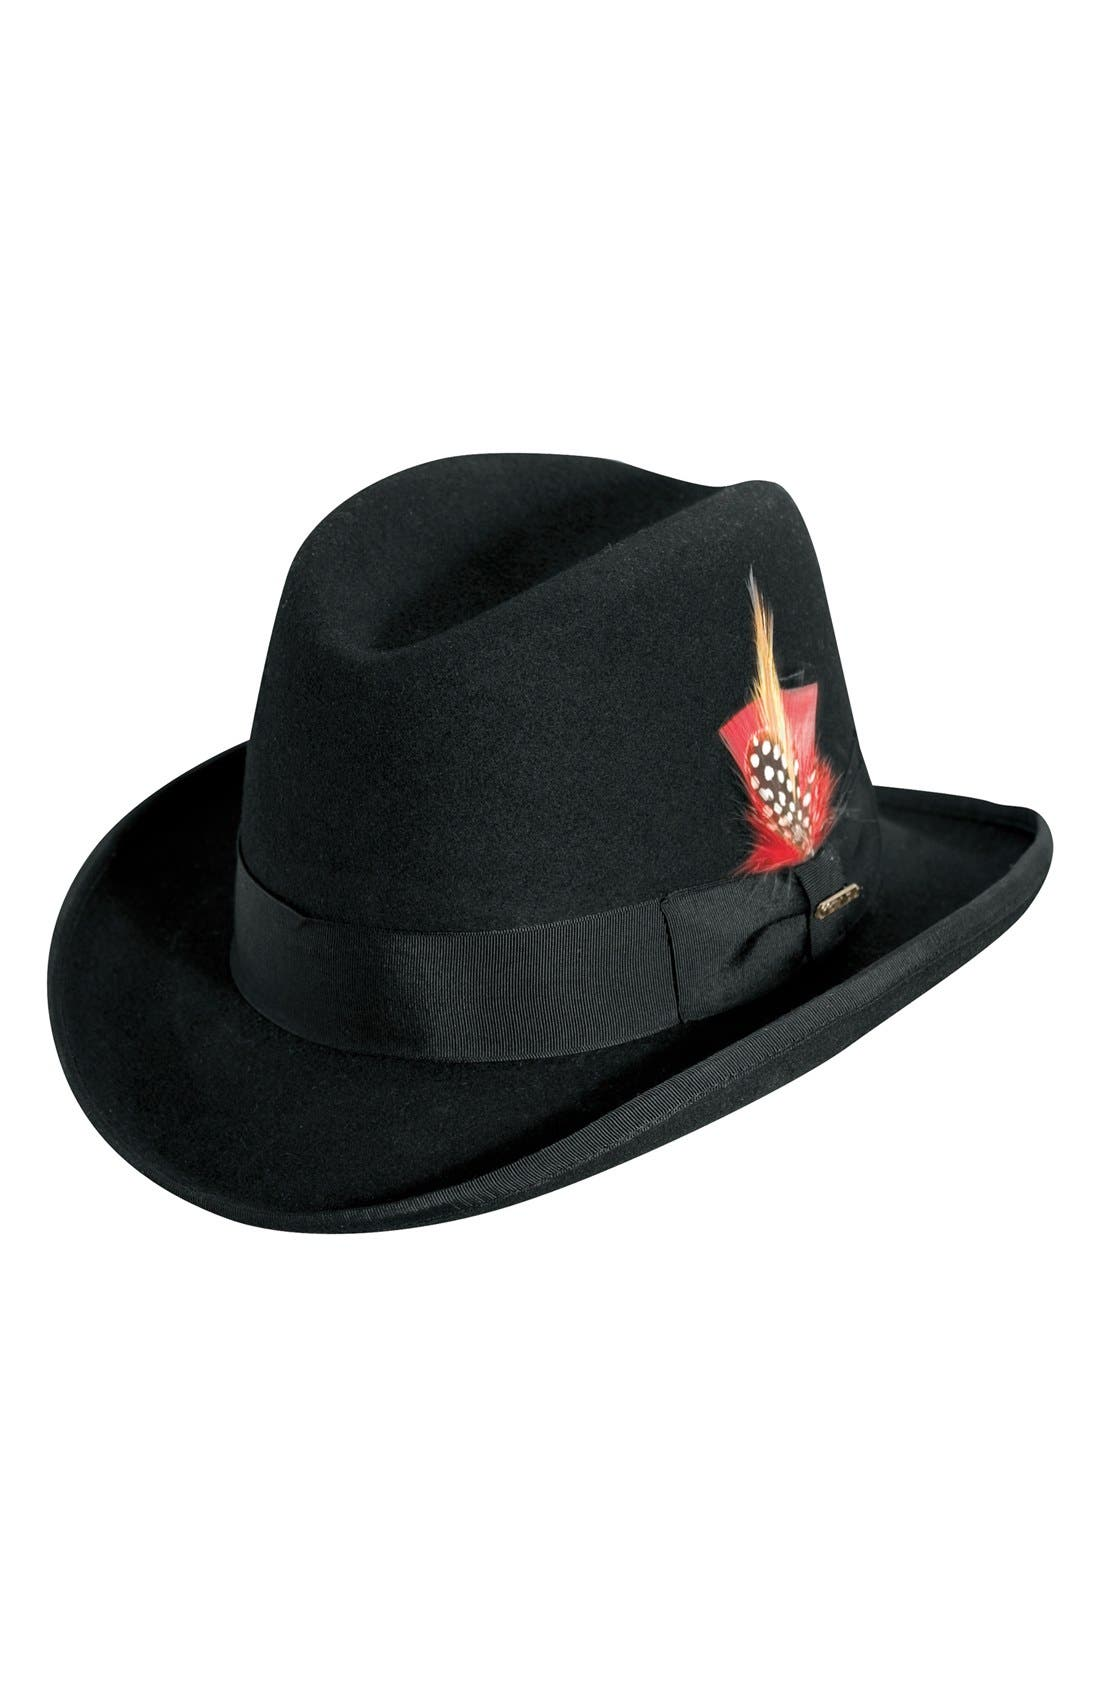 Main Image - Scala Wool Homburg Hat